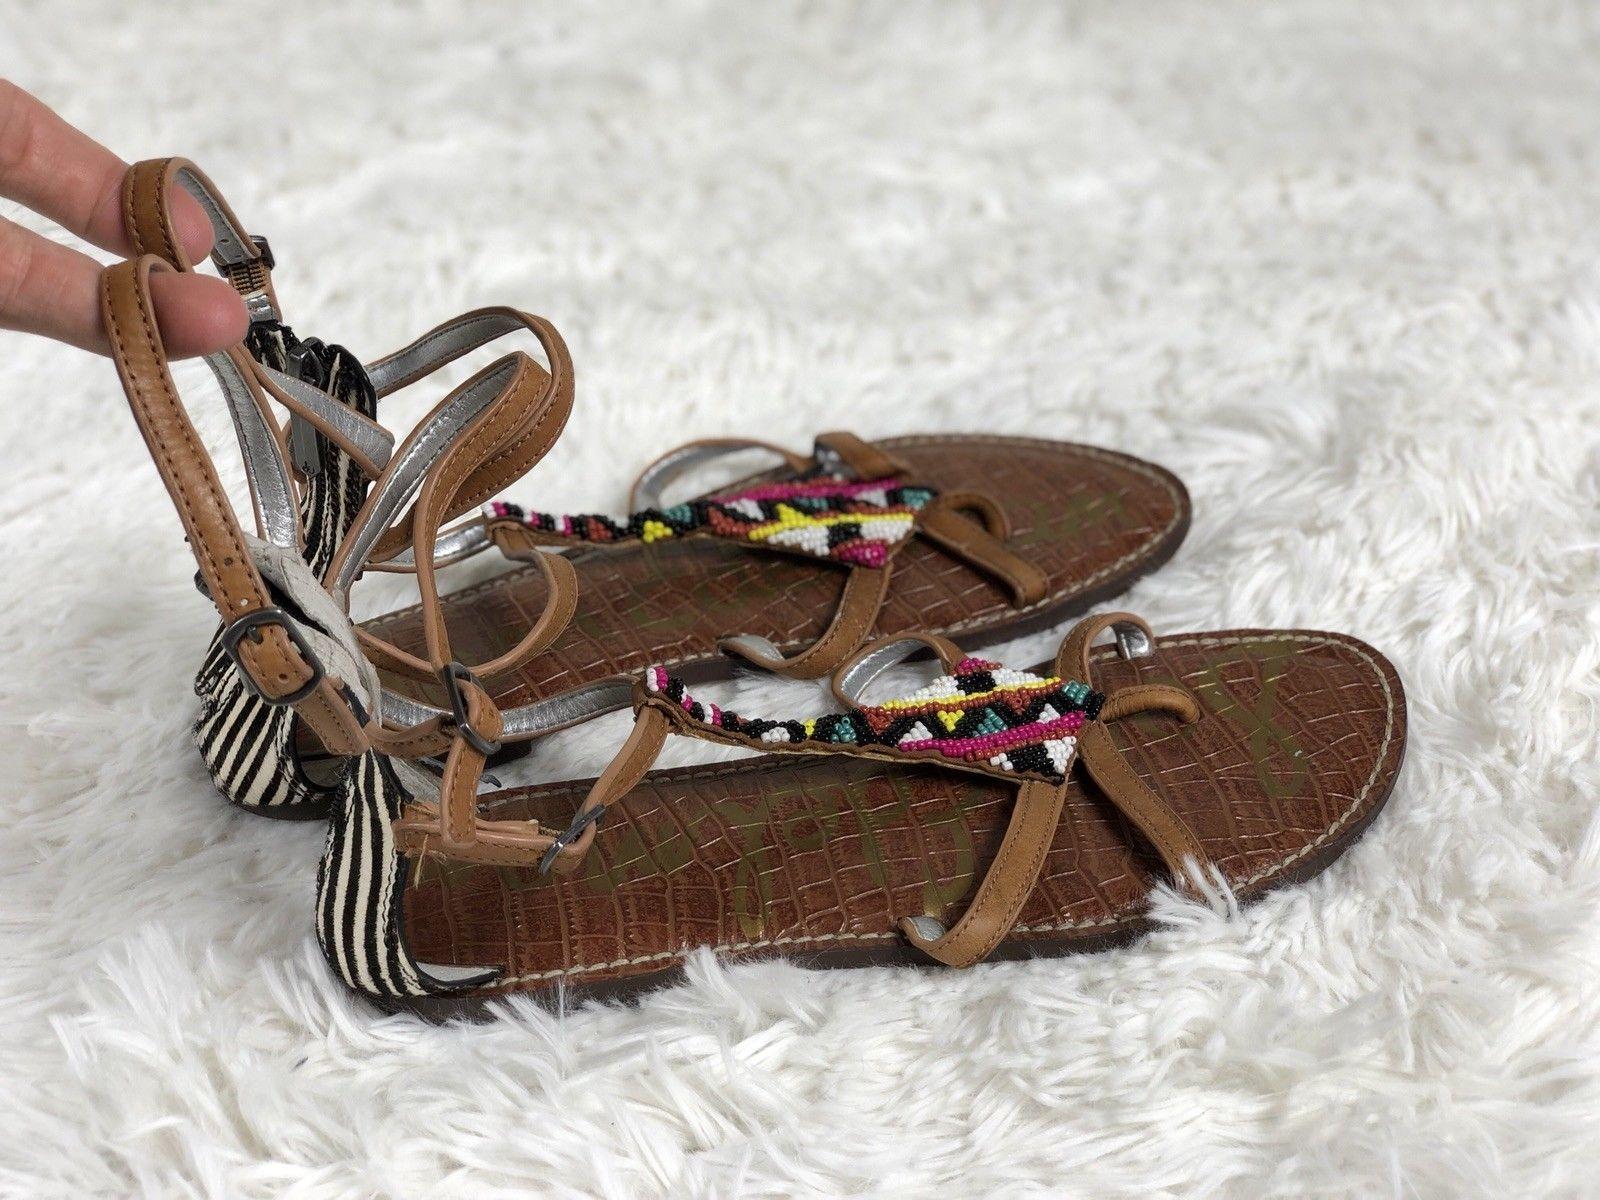 e85acda4a 17.95 ❤ Sam Edelman GISELLE Zebra Heel Beaded Straps Gladiator Sandals 10 ❤   edelman